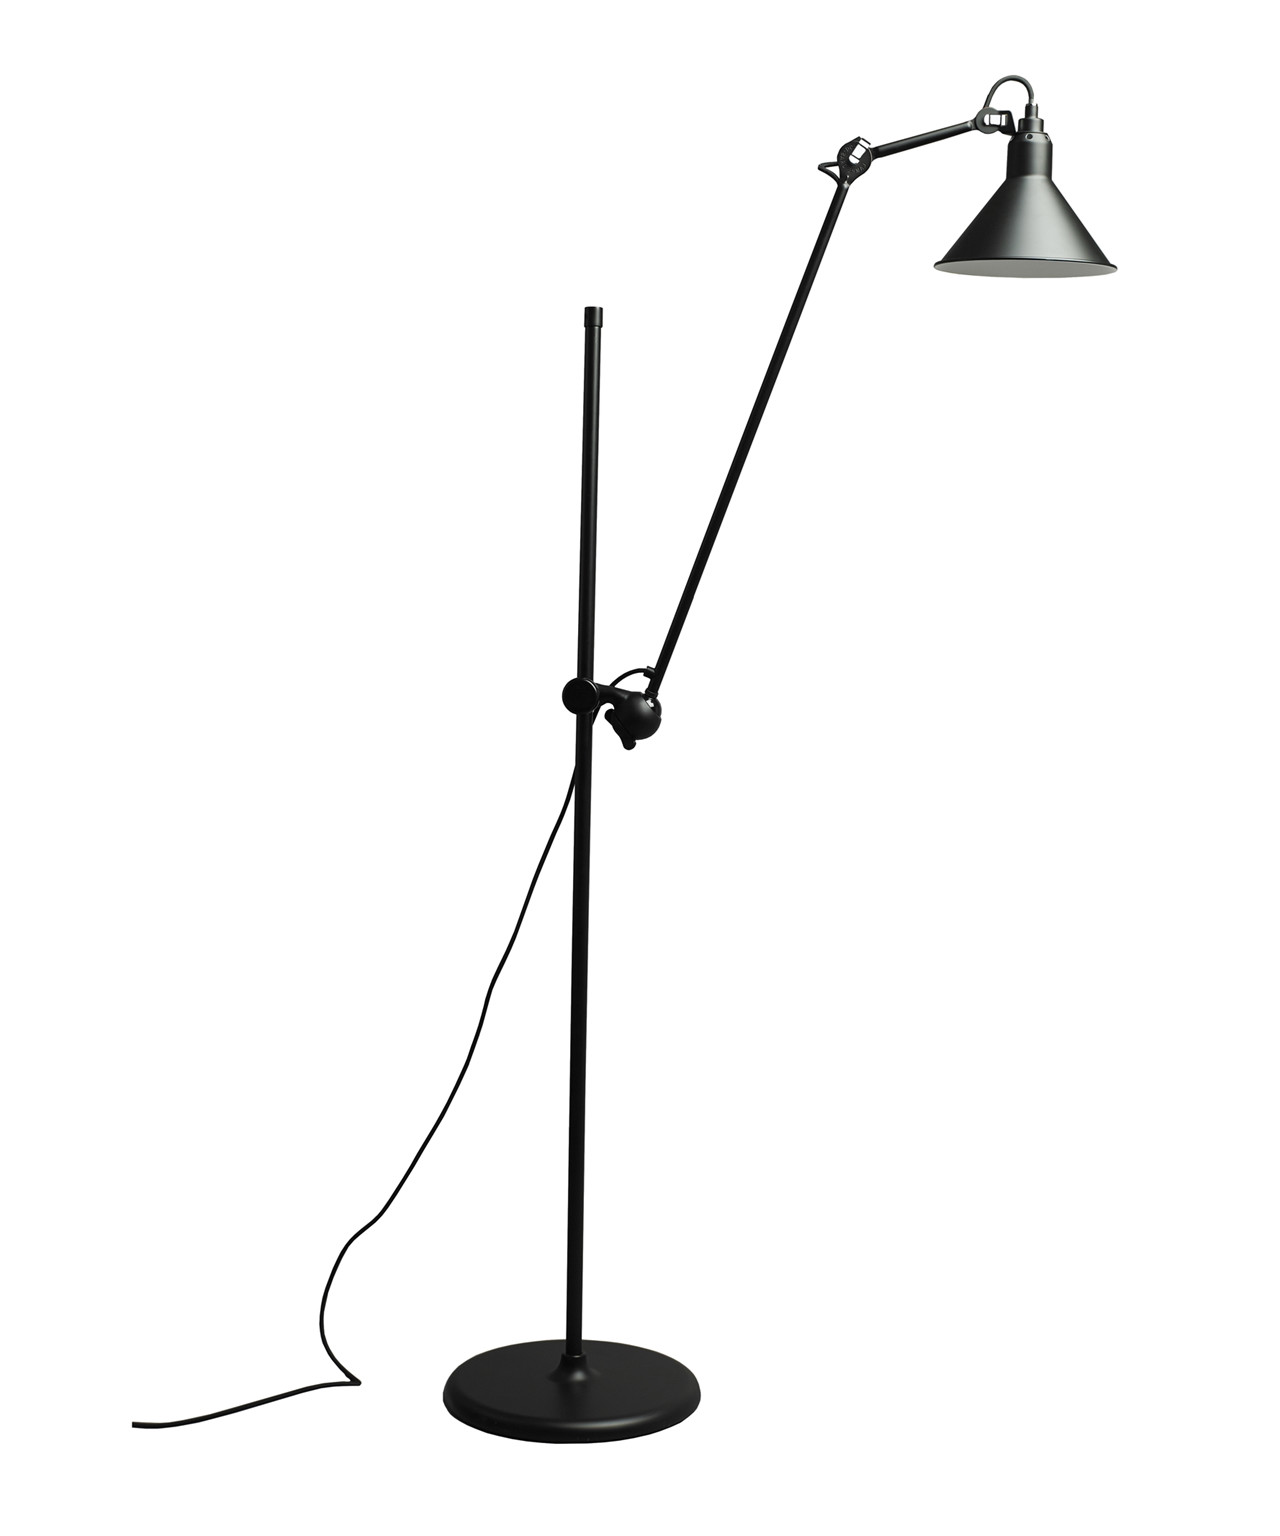 Image of   215 Gulvlampe Sort - Lampe Gras